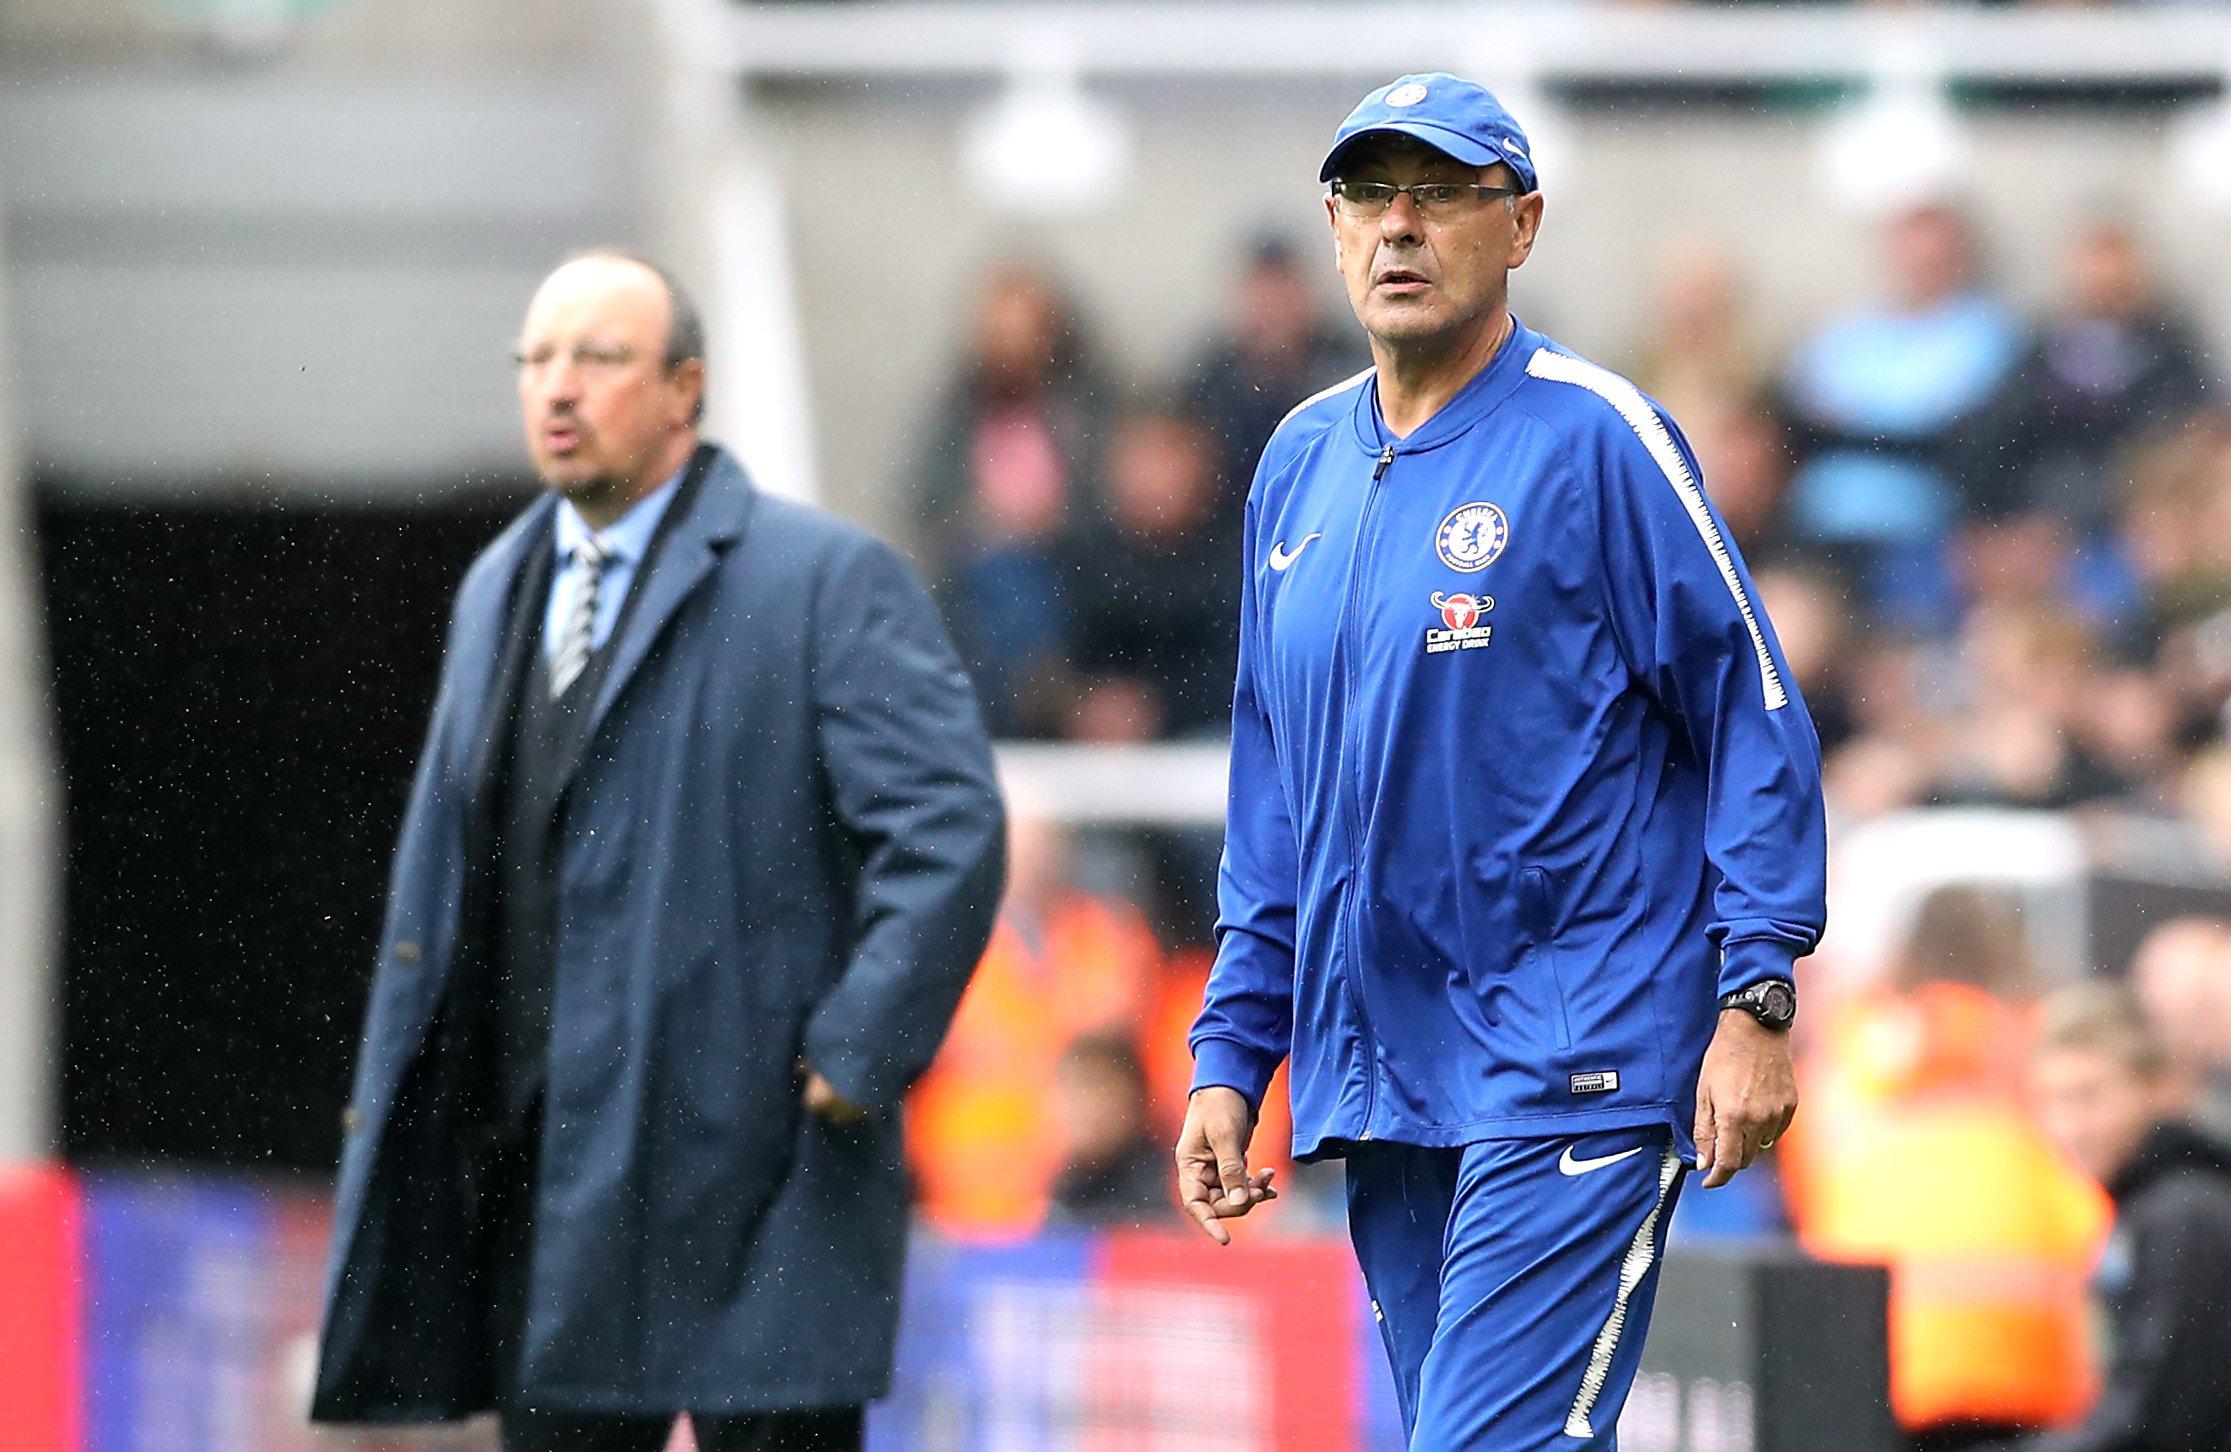 Maurizio Sarri shocked by Rafael Benitez in Chelsea win over Newcastle